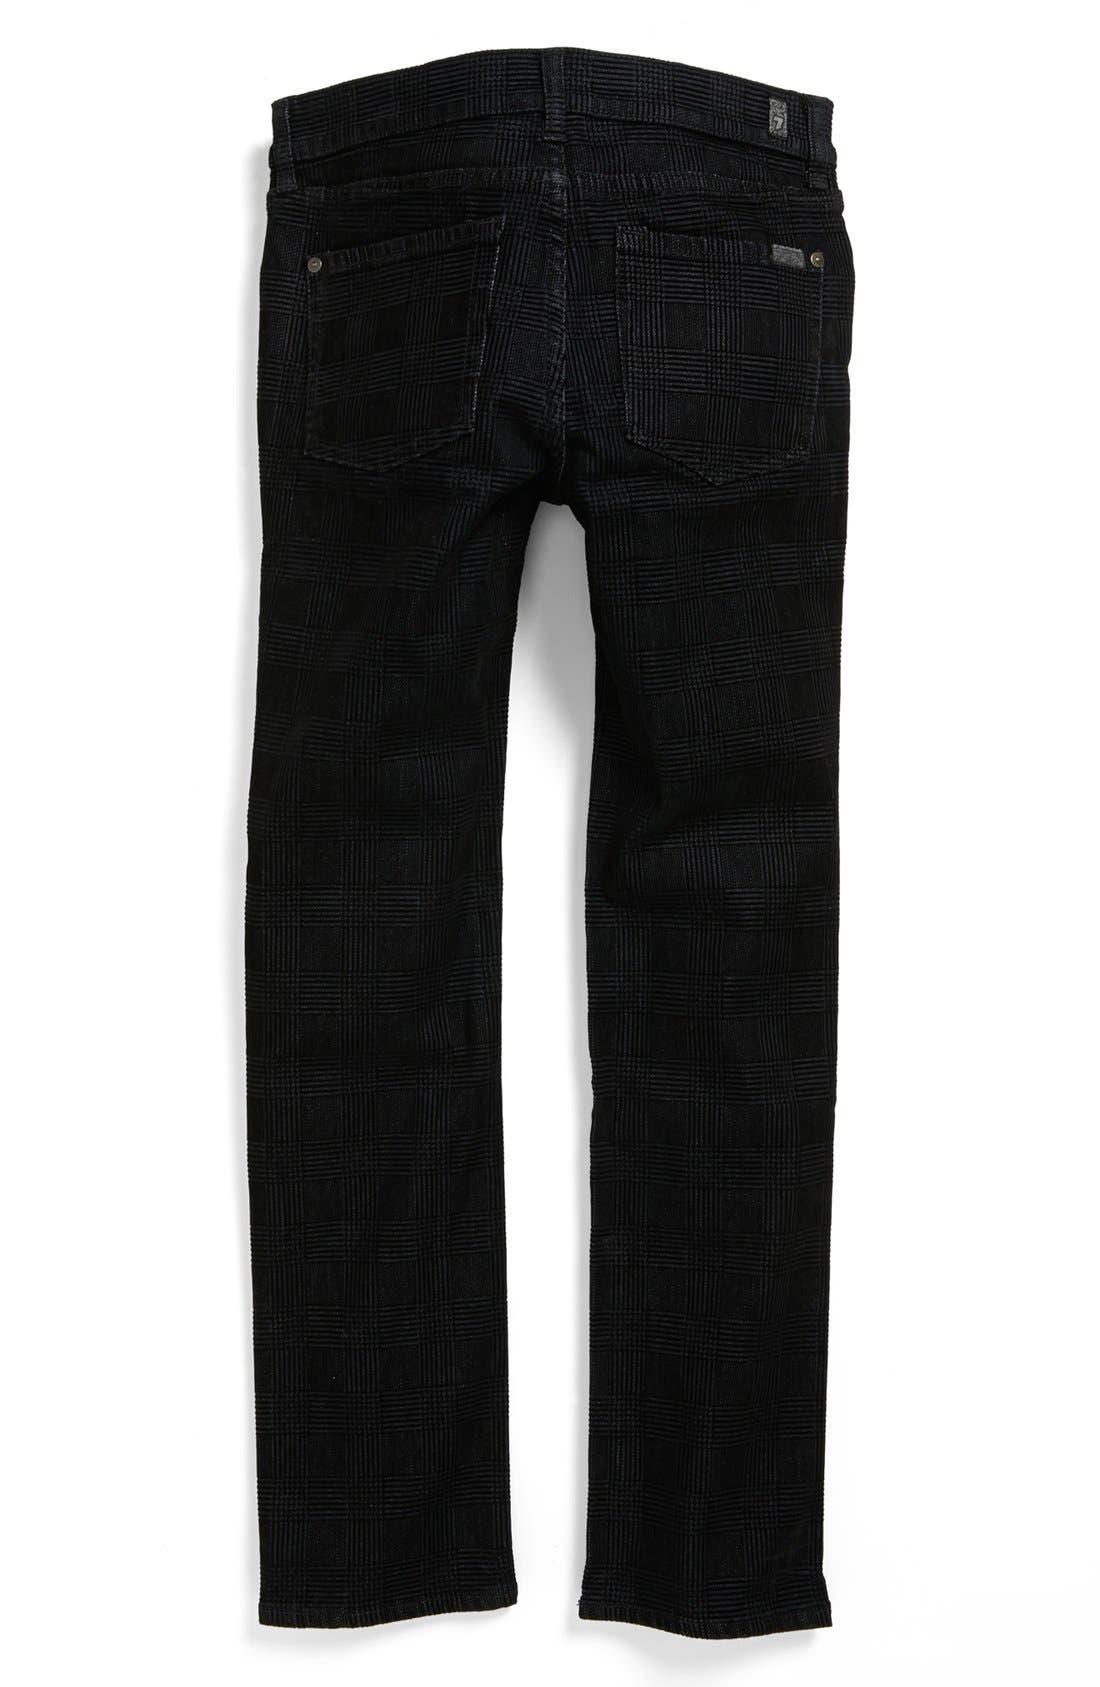 Alternate Image 1 Selected - 7 For All Mankind®  'Slimmy' Straight Leg Jeans (Little Boys)